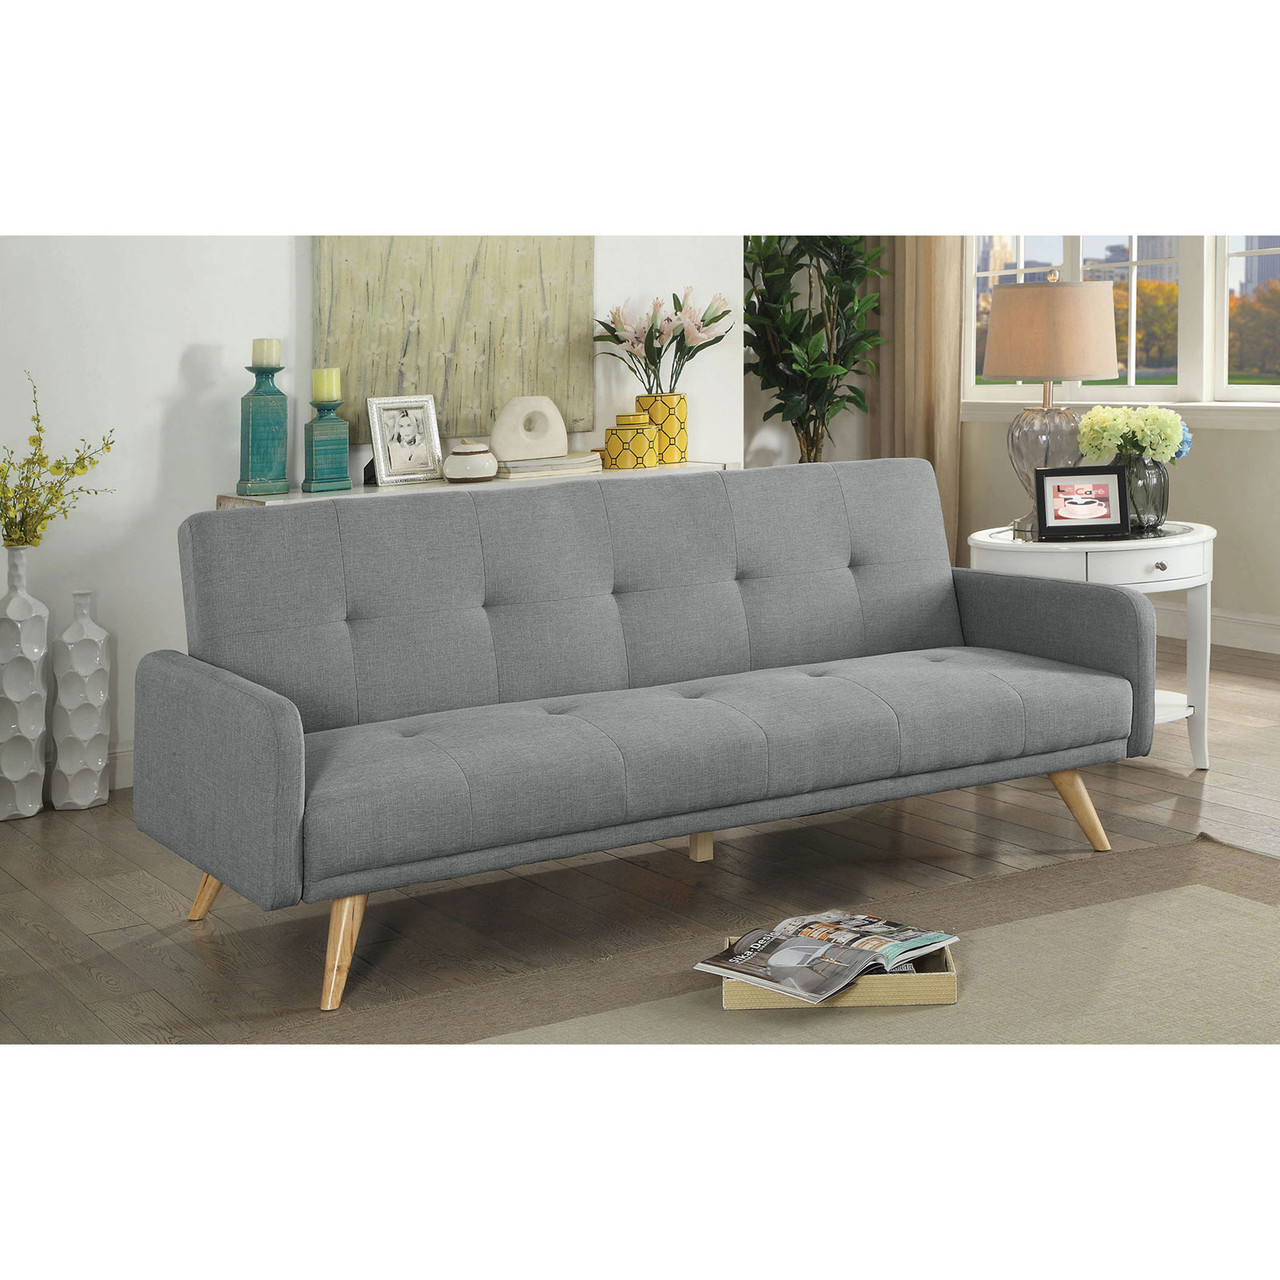 The Burgos Mid Century Modern Futon Sofa Available At Furniture Express Hi Serving Honolulu Hi And Surrounding Areas